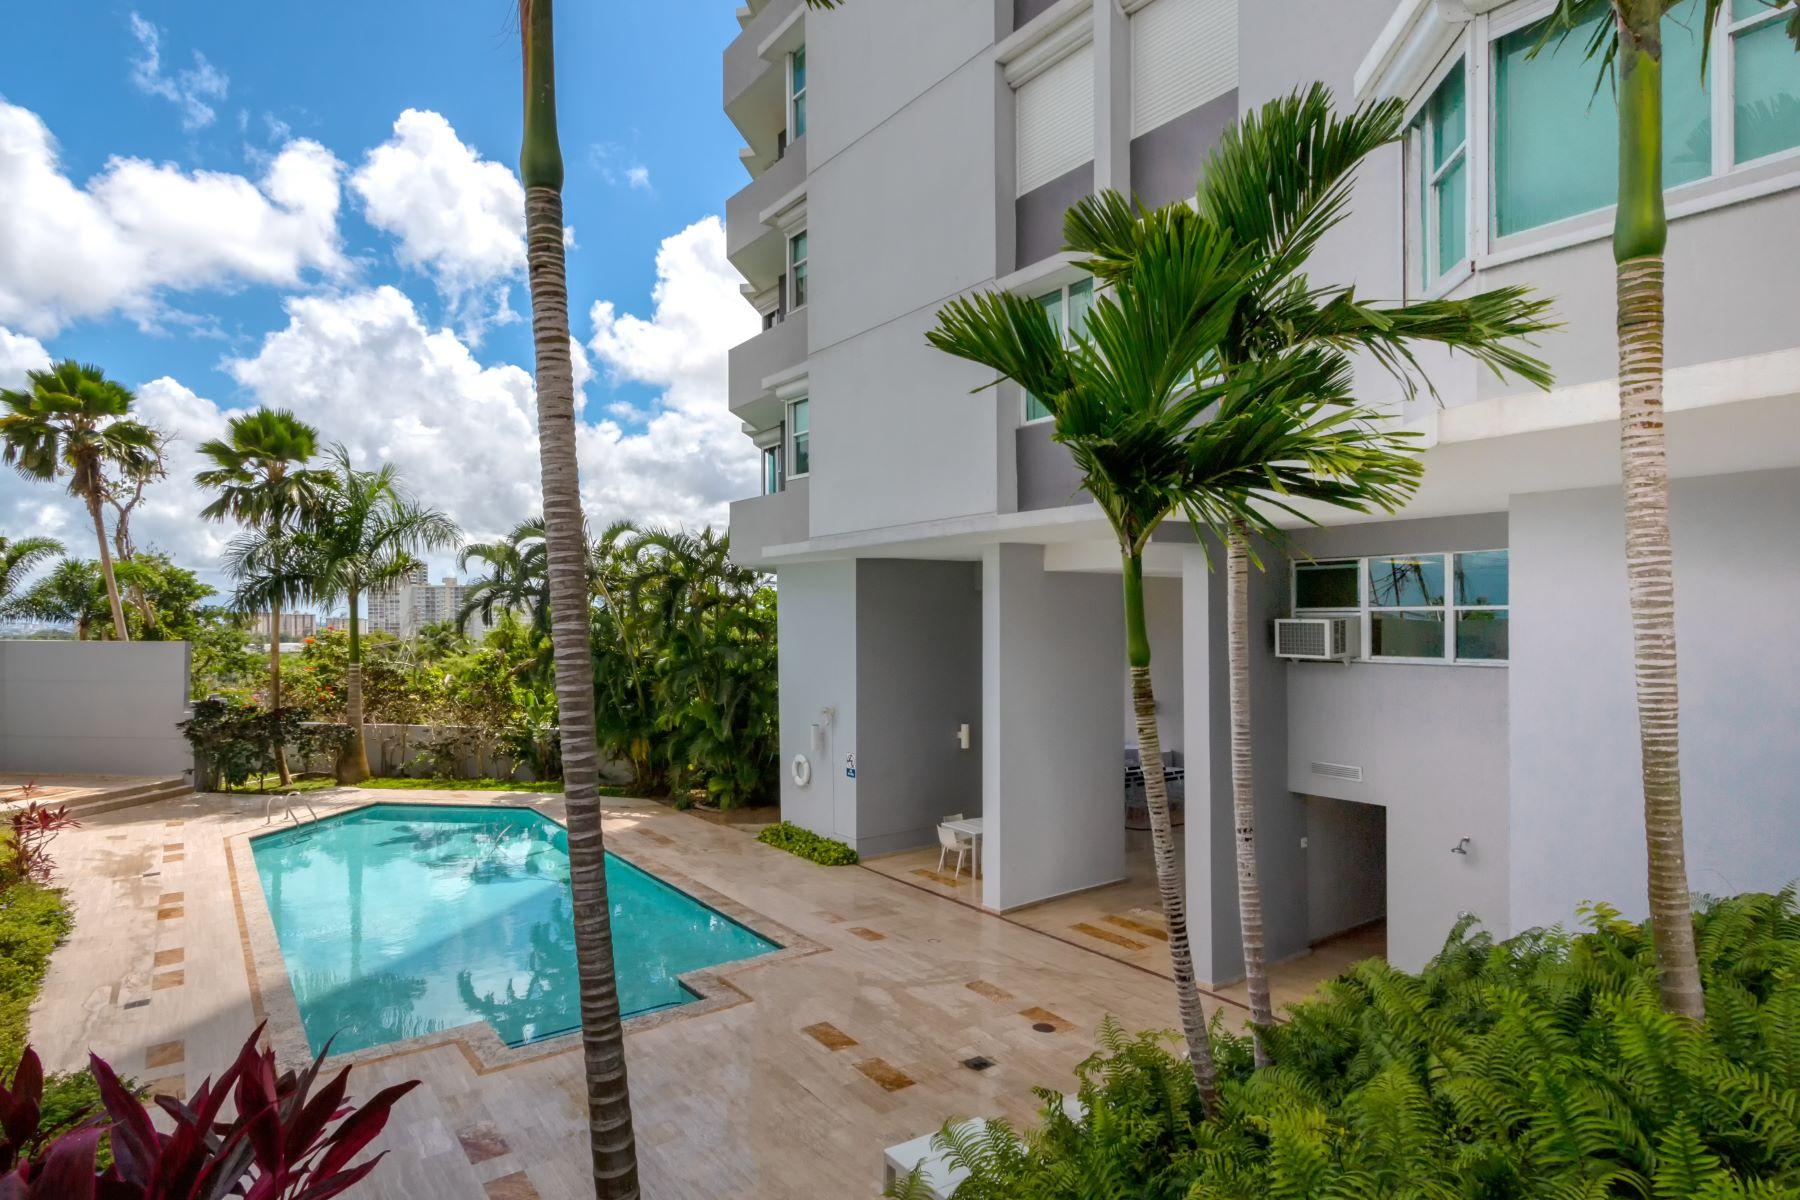 Additional photo for property listing at Soaring Skyline Duplex Penthouse at La Cima PH-1904 Condominio La Cima de Torrimar Guaynabo, 00969 Puerto Rico